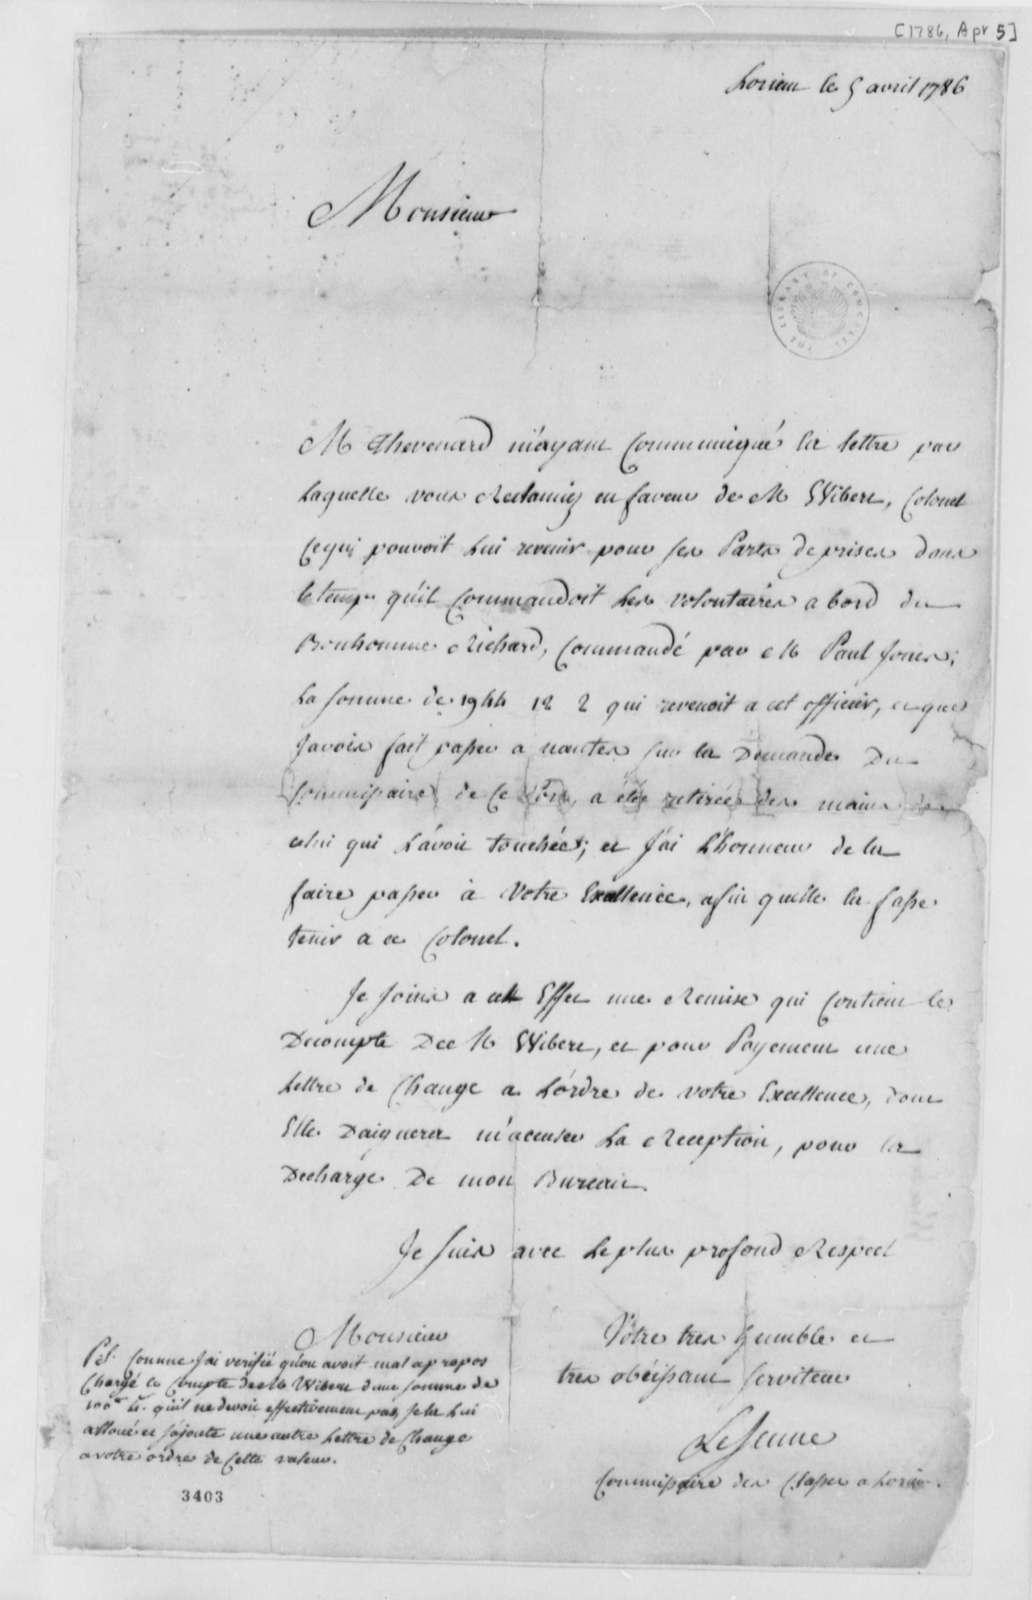 Le Jeune to Thomas Jefferson, April 5, 1786, in French